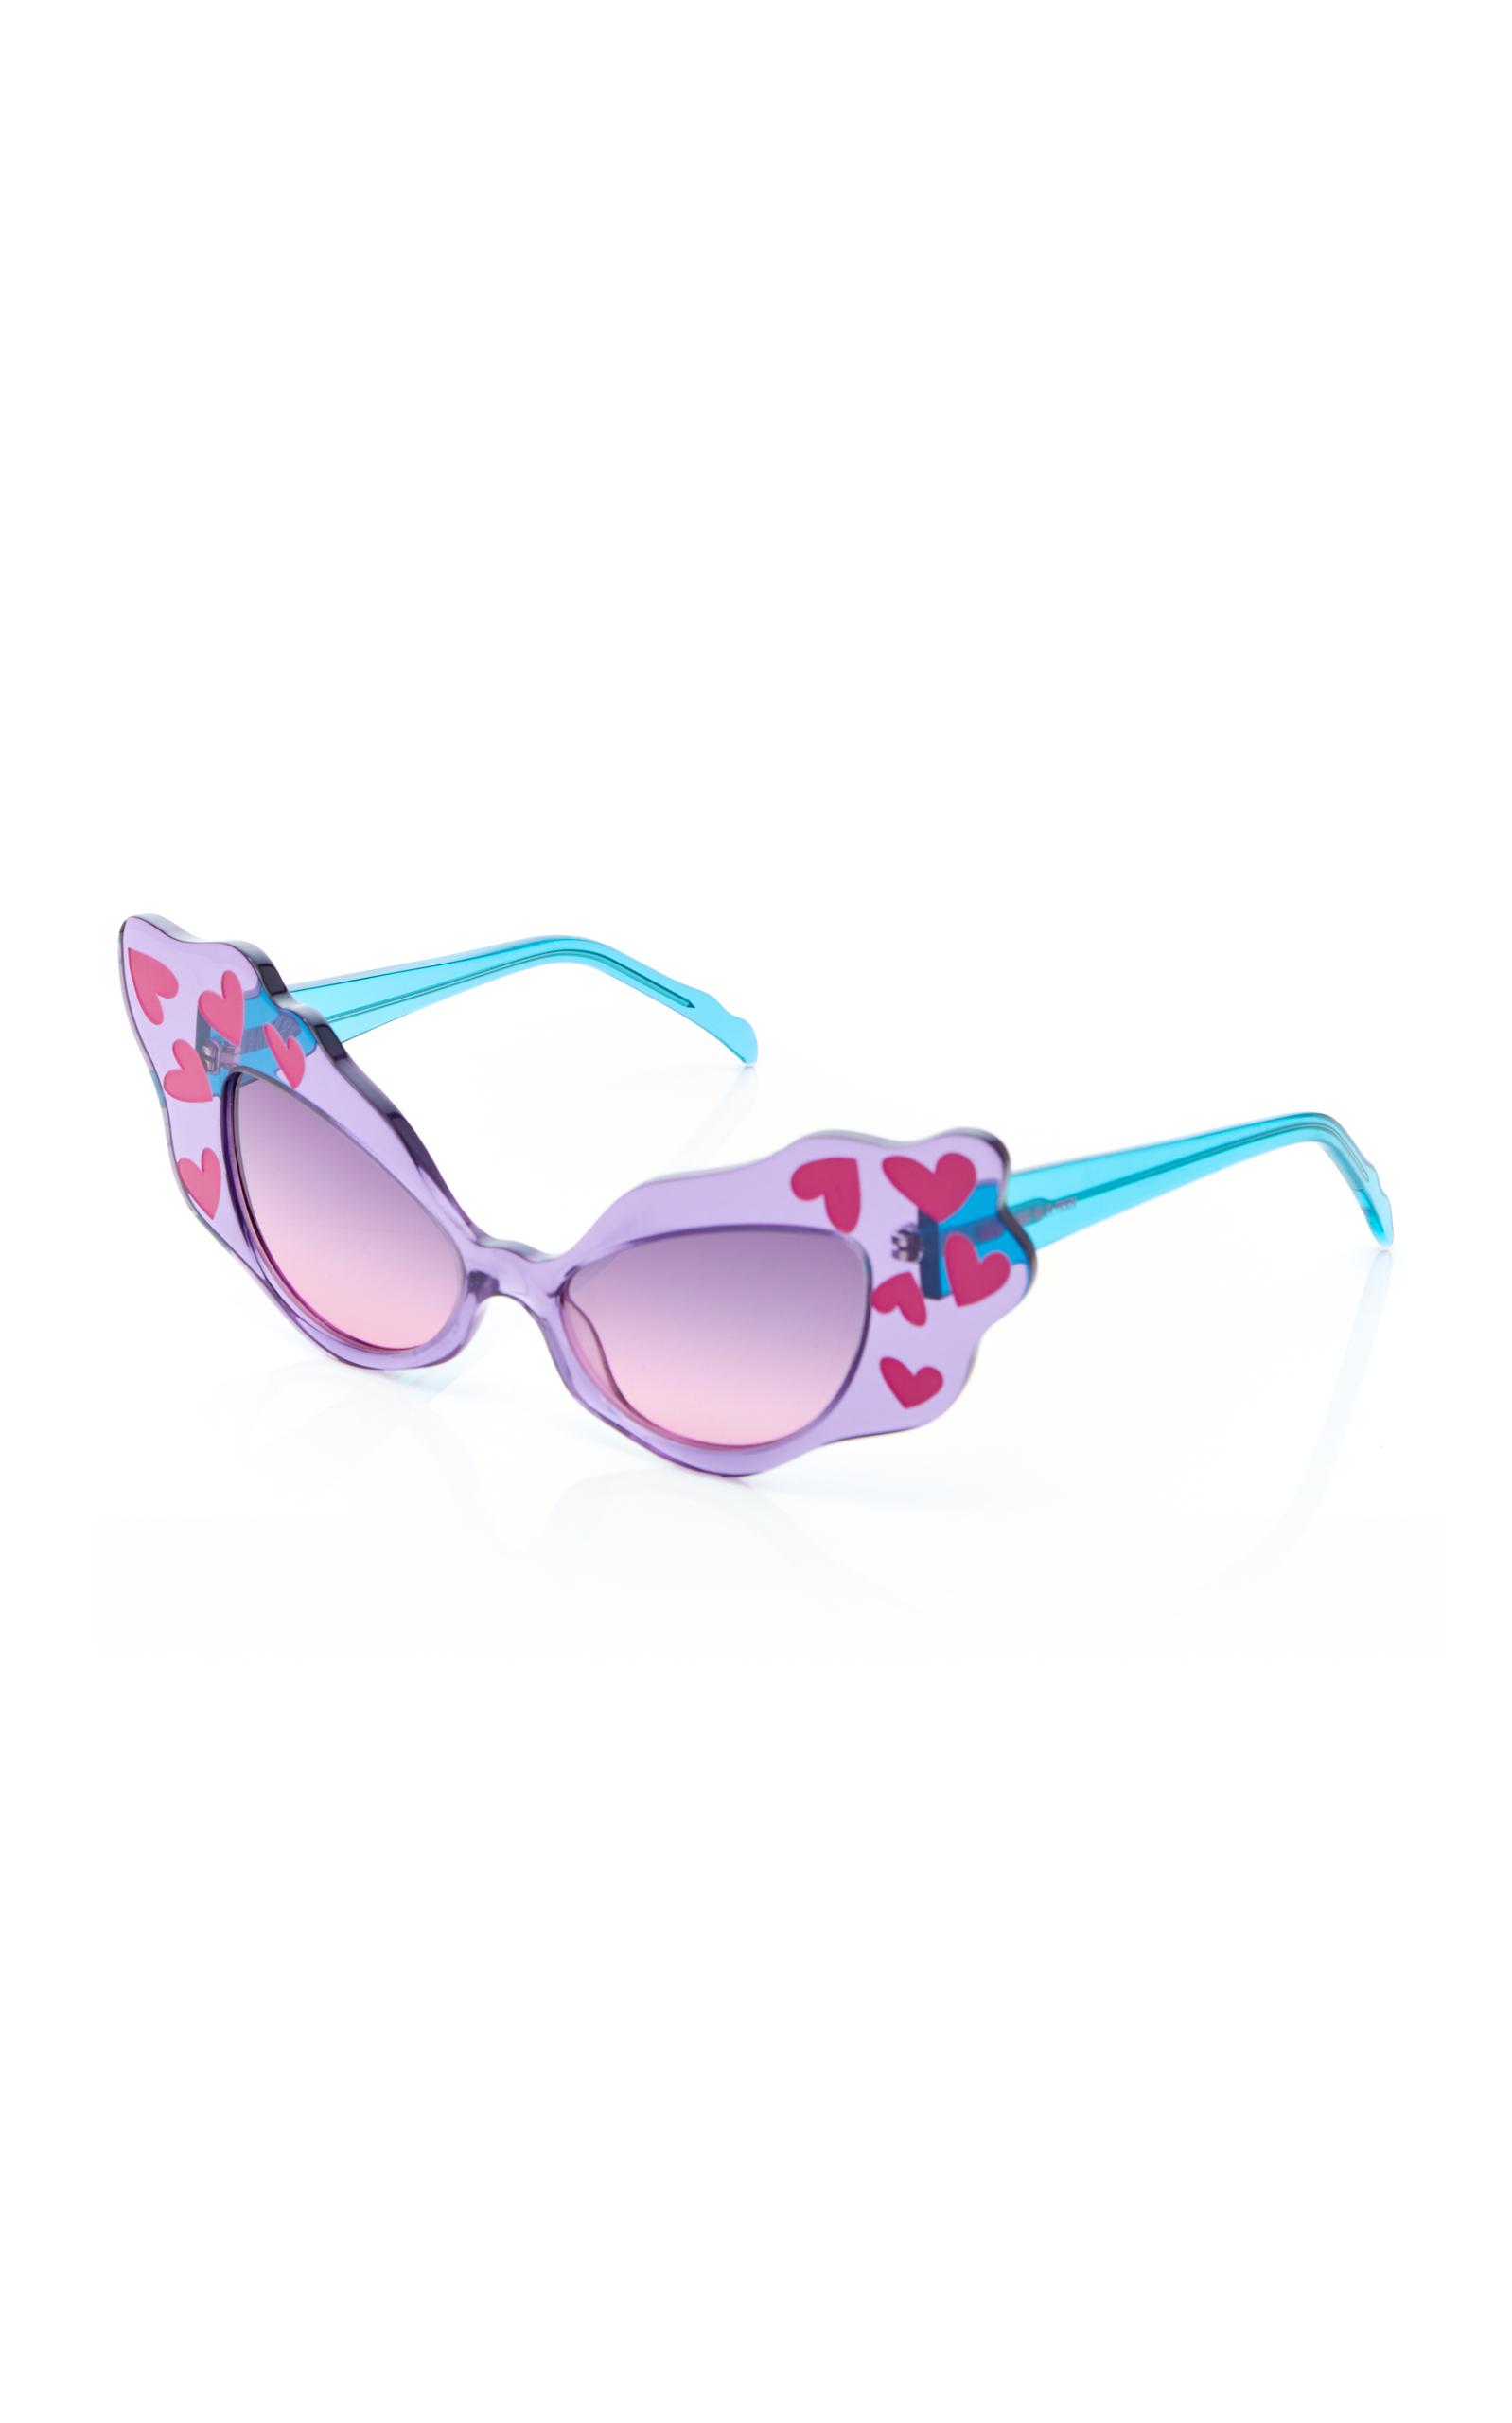 d8eb76dbde Cat-eye Sunglasses by Agatha Ruiz de la Prada